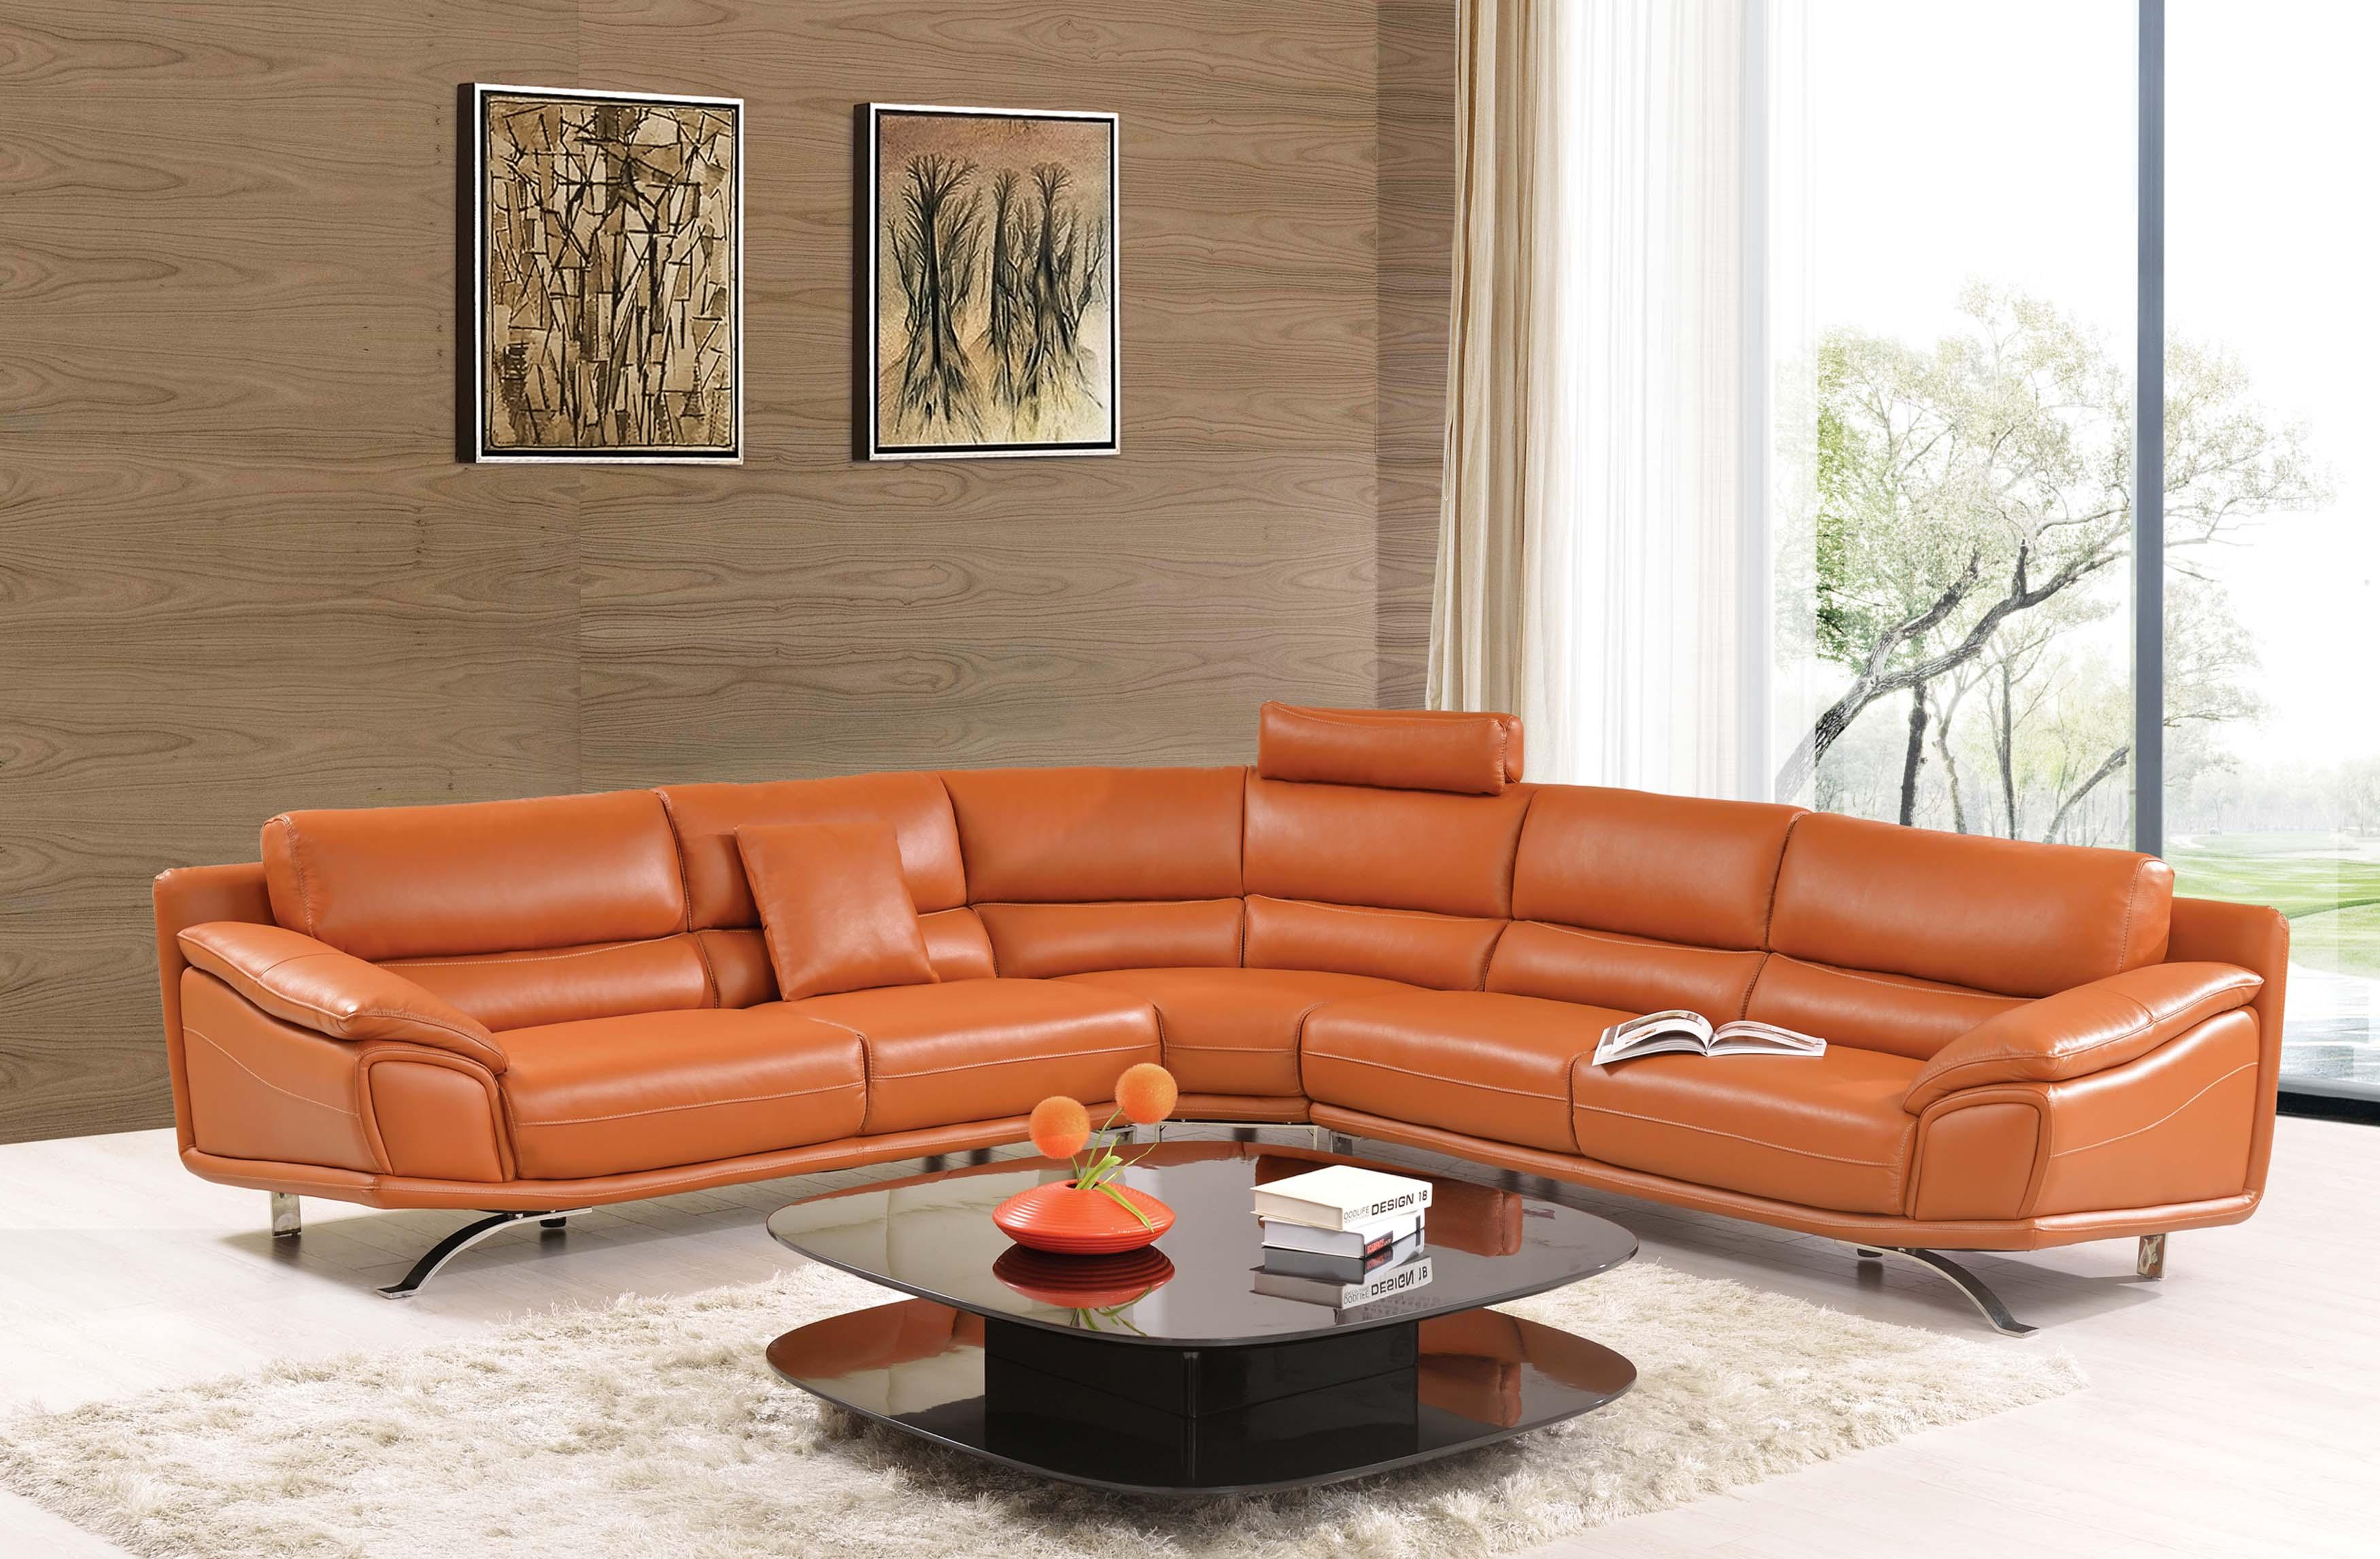 Terrific 533 Orange Leather Sectional By Esf Spiritservingveterans Wood Chair Design Ideas Spiritservingveteransorg